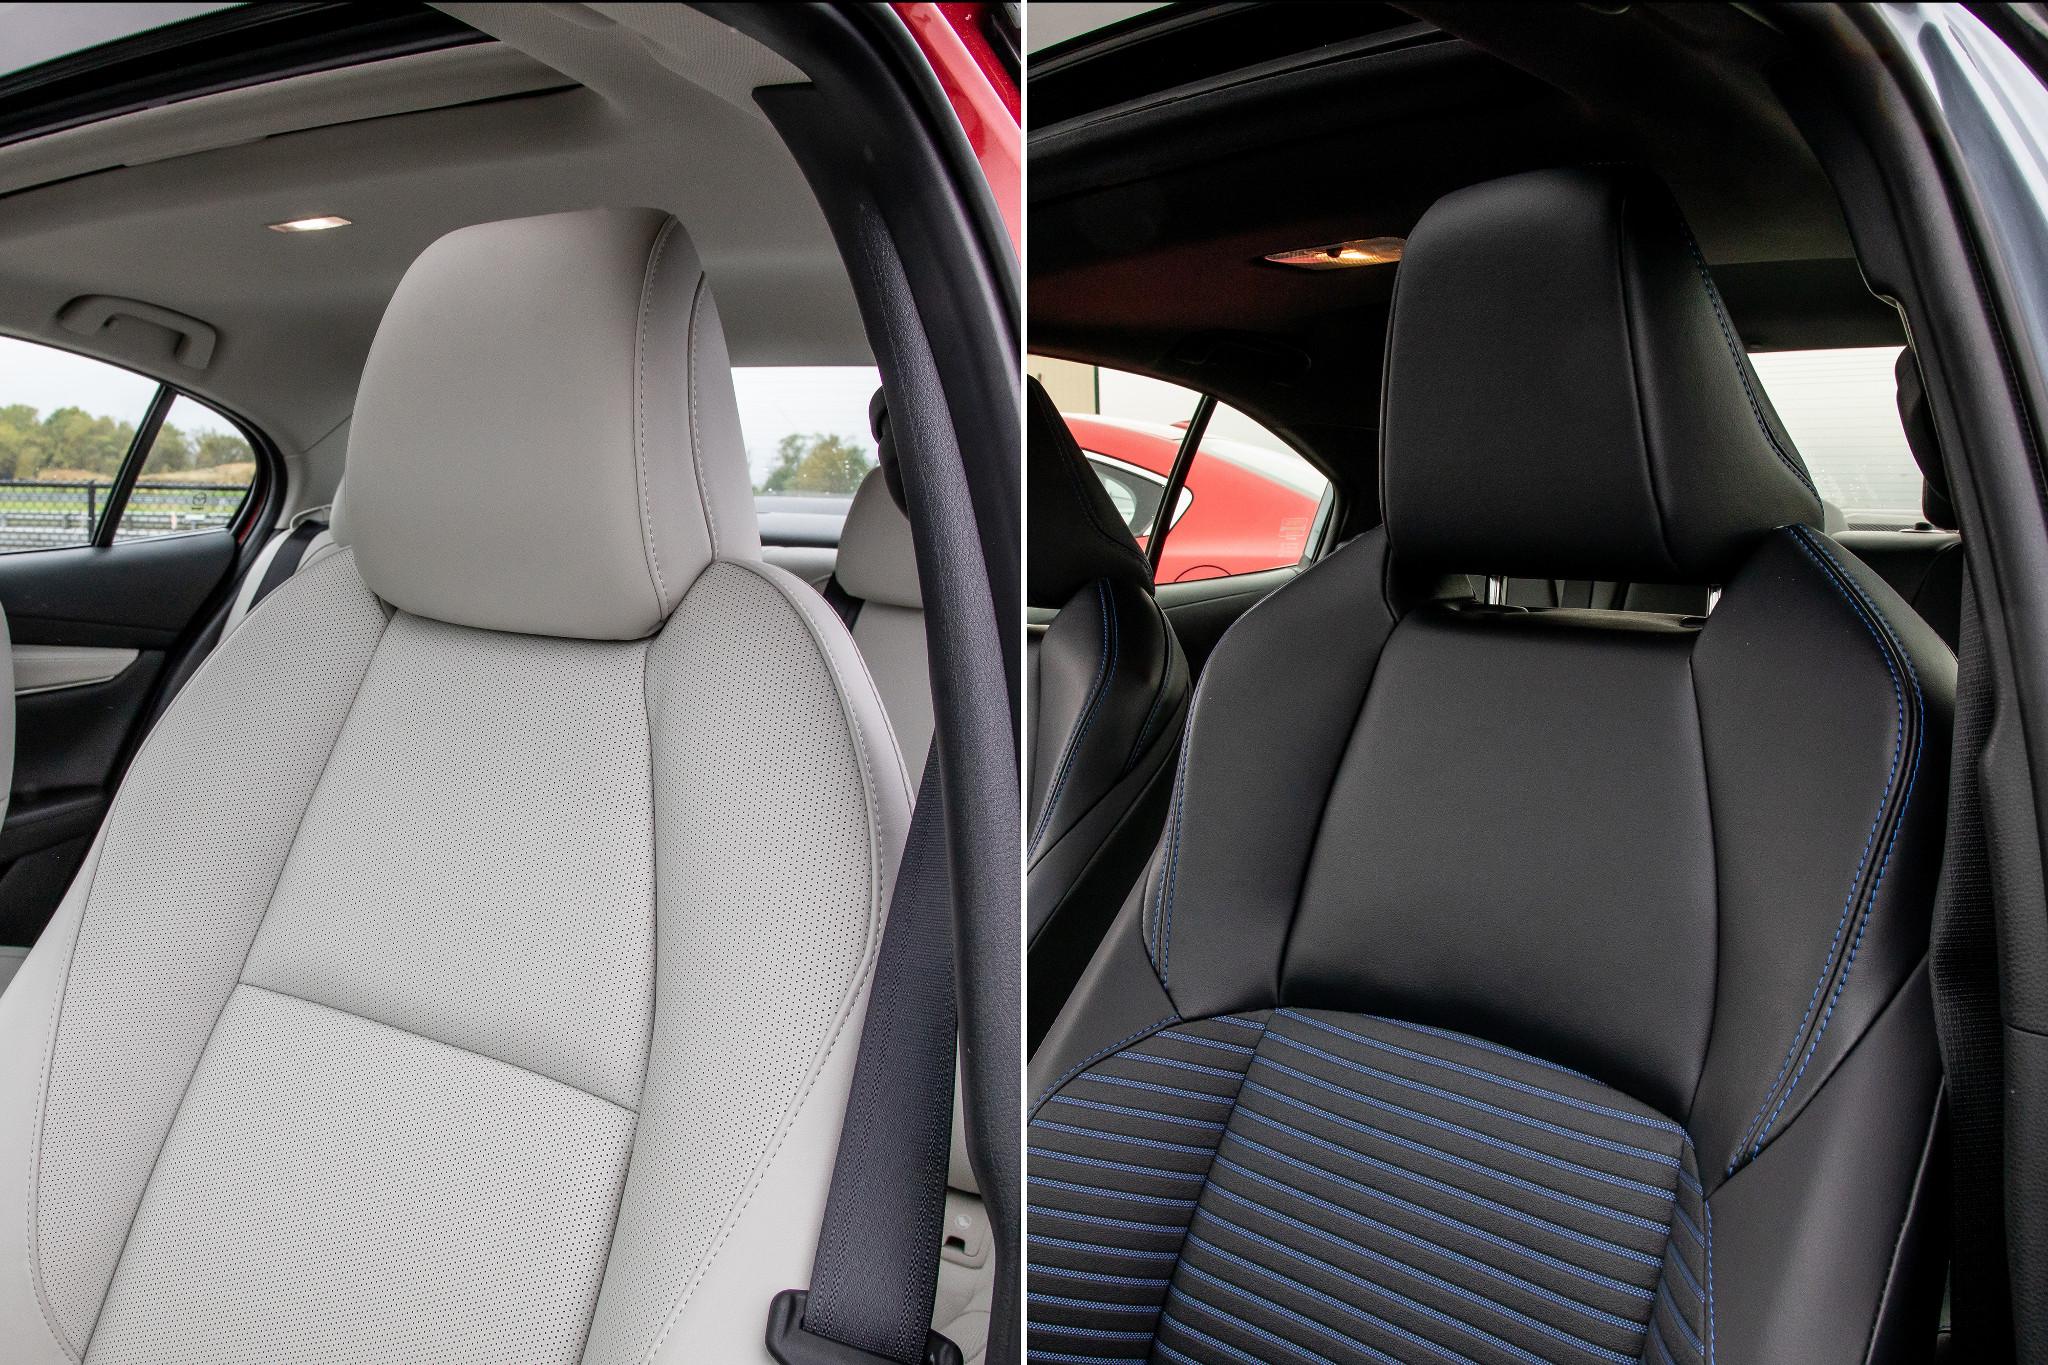 mazda-3-2020-toyota-corolla-xse-2020-04front-row--interior--seat.jpg